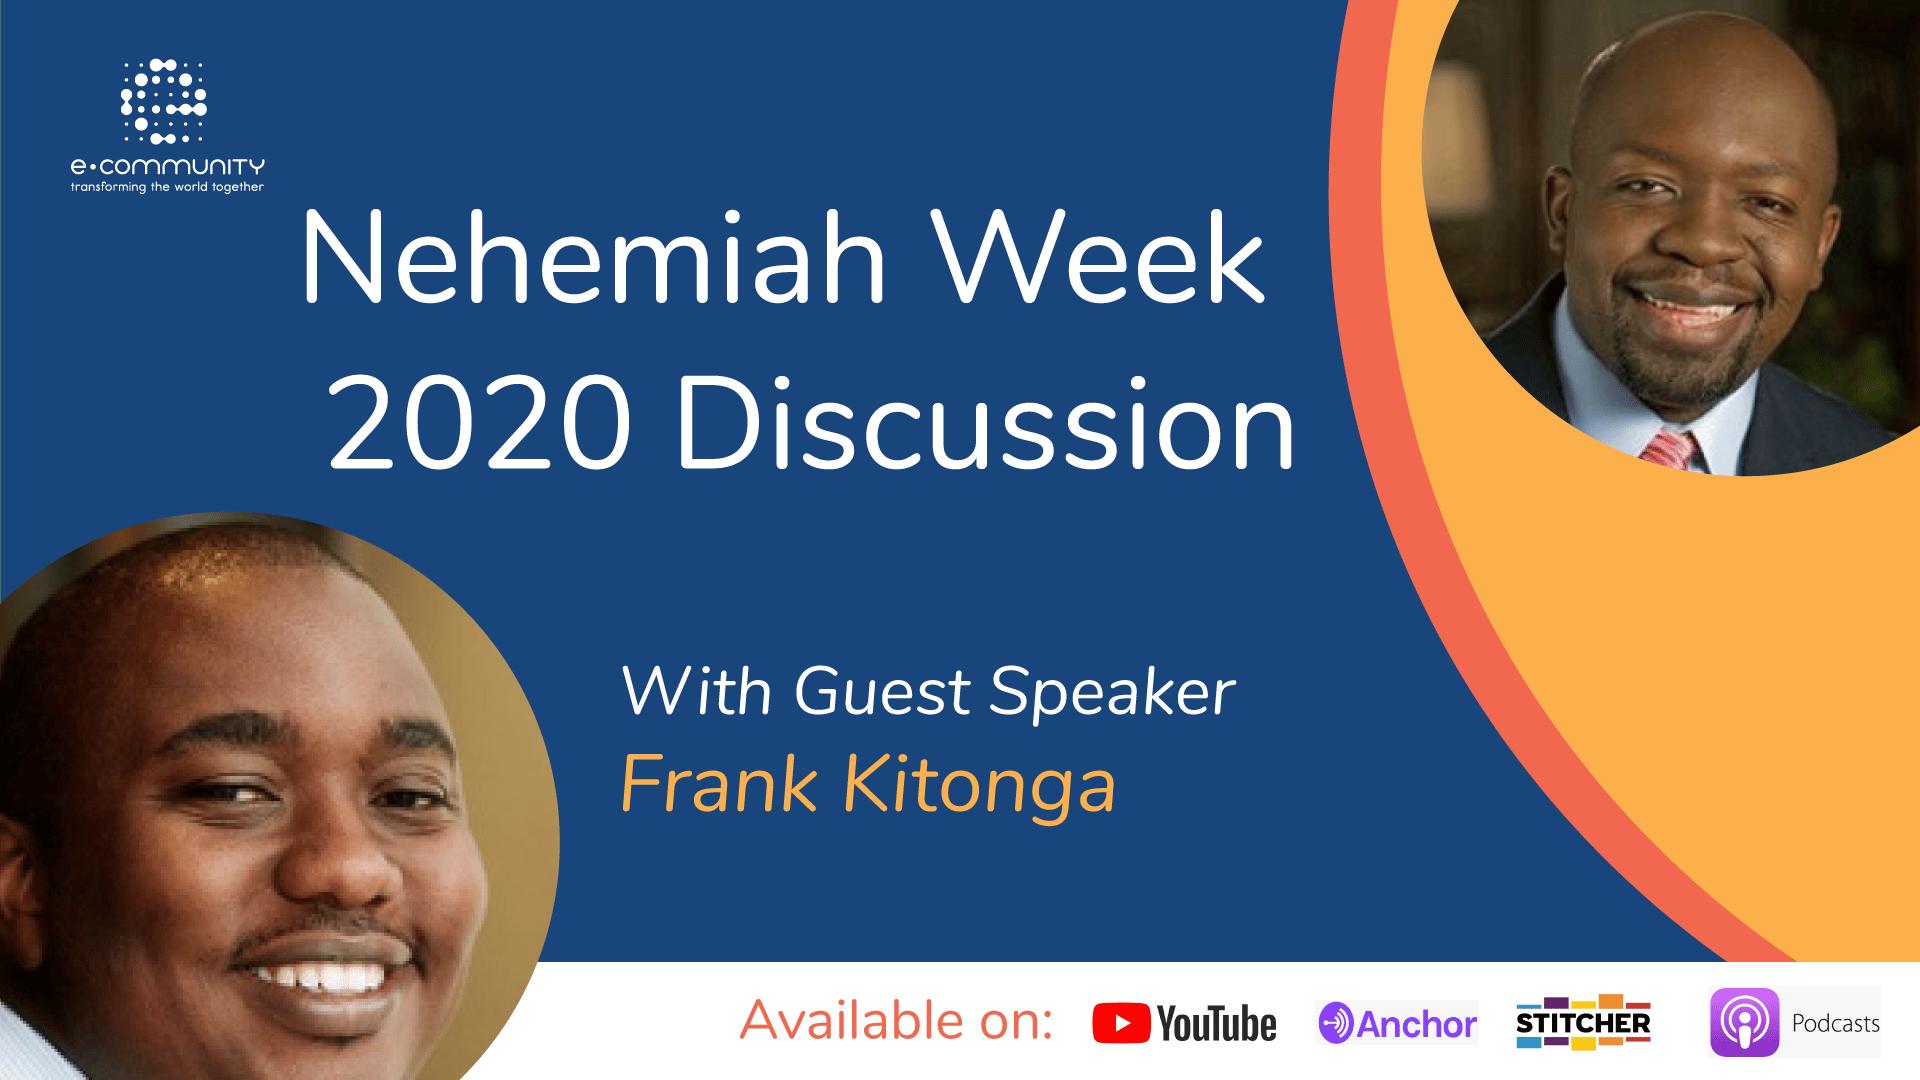 Nehemiah Week 2020 Discussion with Frank Kitonga